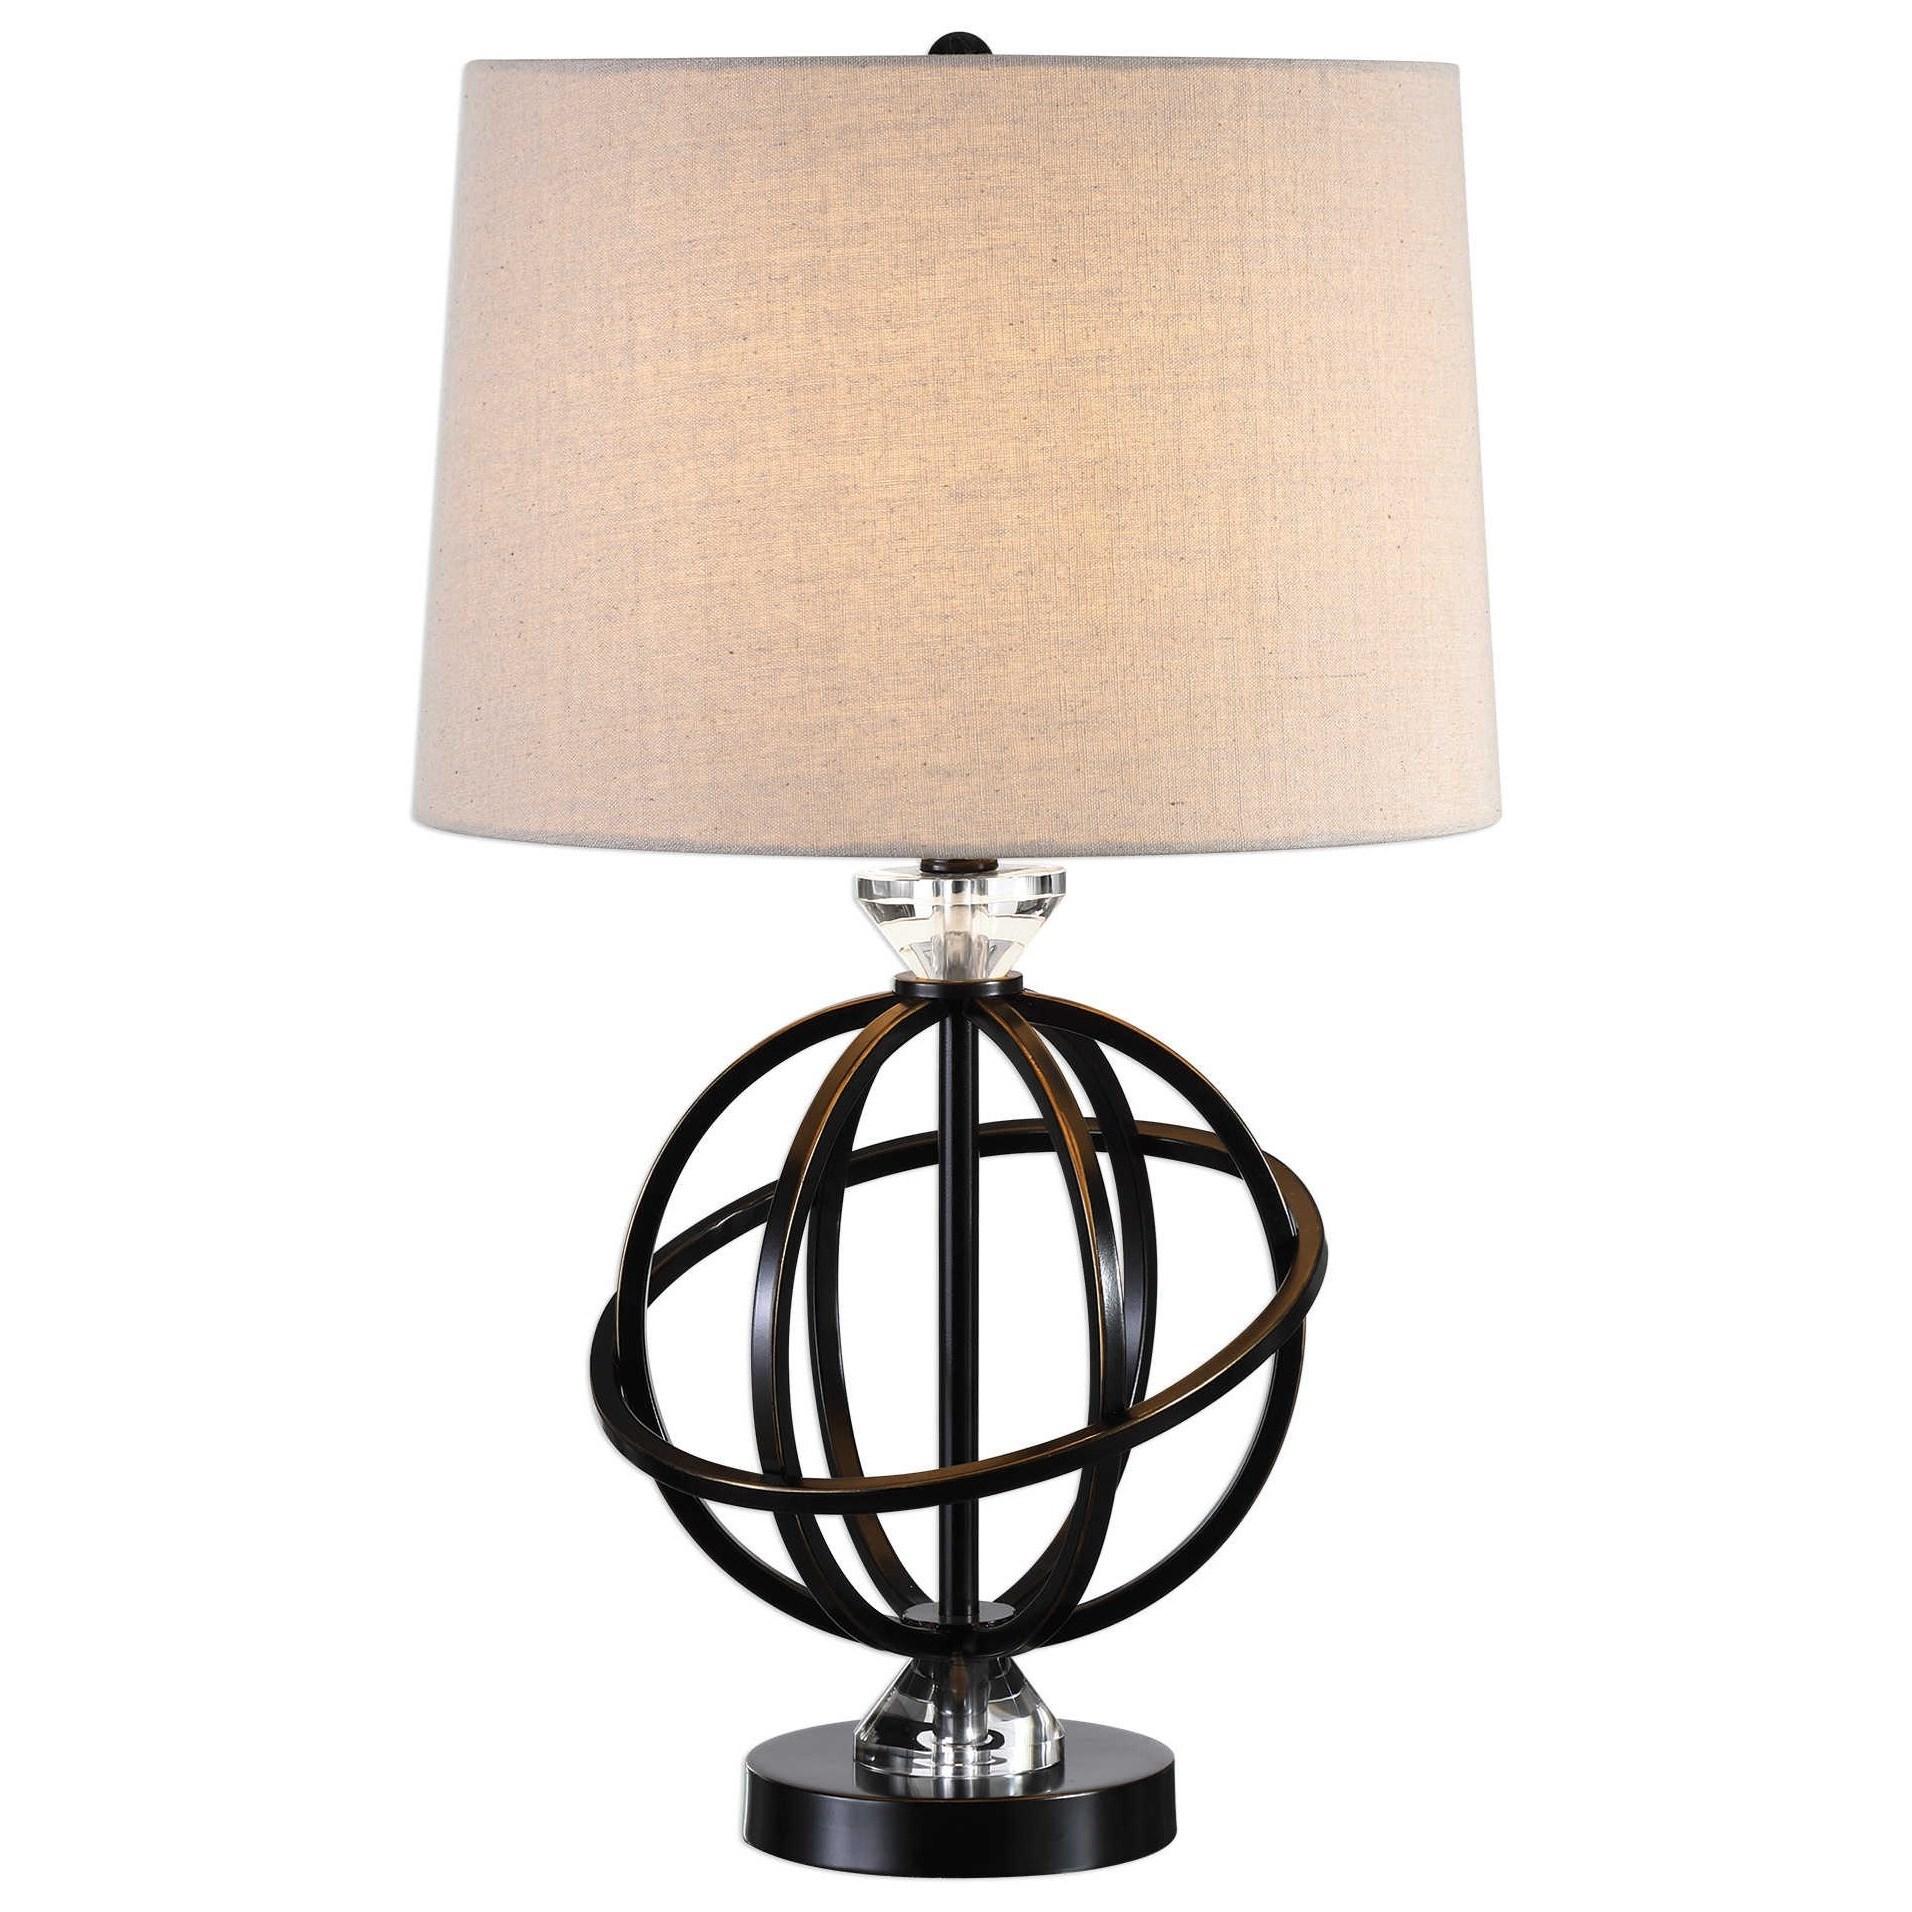 NEW BLACK GLOSS TABLE LAMP WITH HANGING CRYSTALS AND BLACK RIBBED SHADE,